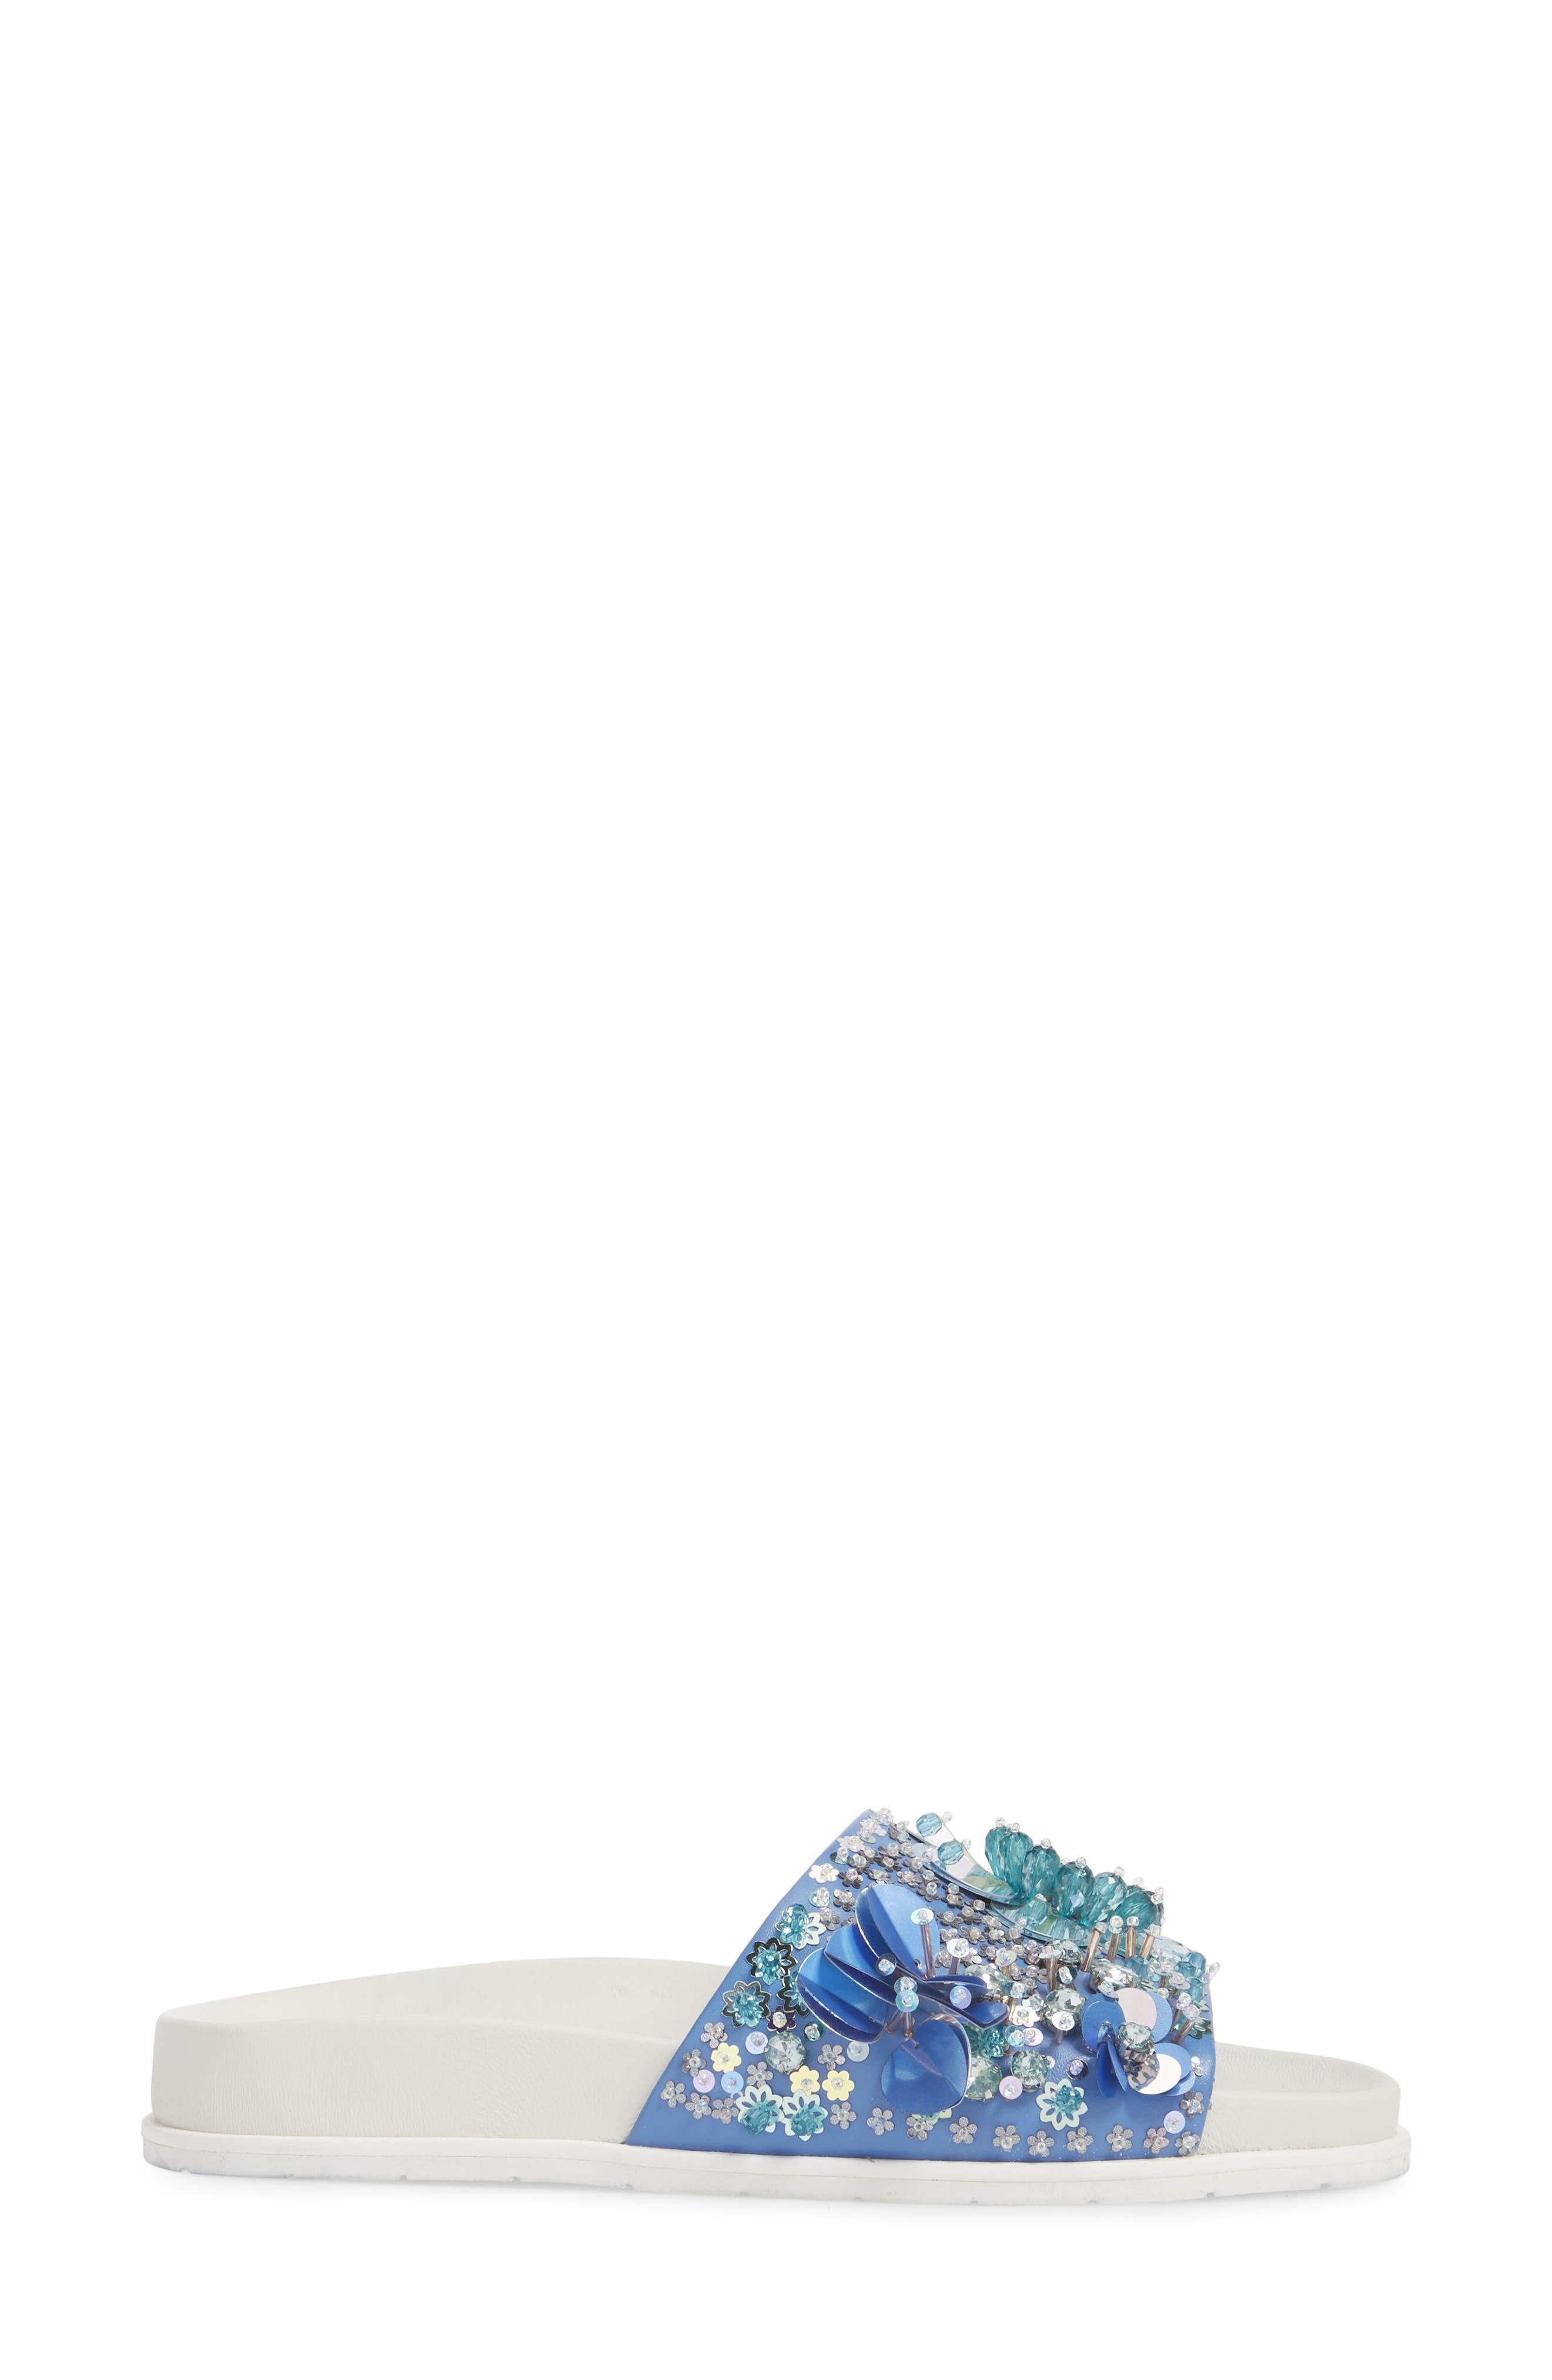 Xenia Sequin Embellished Sandal,                             Alternate thumbnail 3, color,                             Blue Multi Fabric